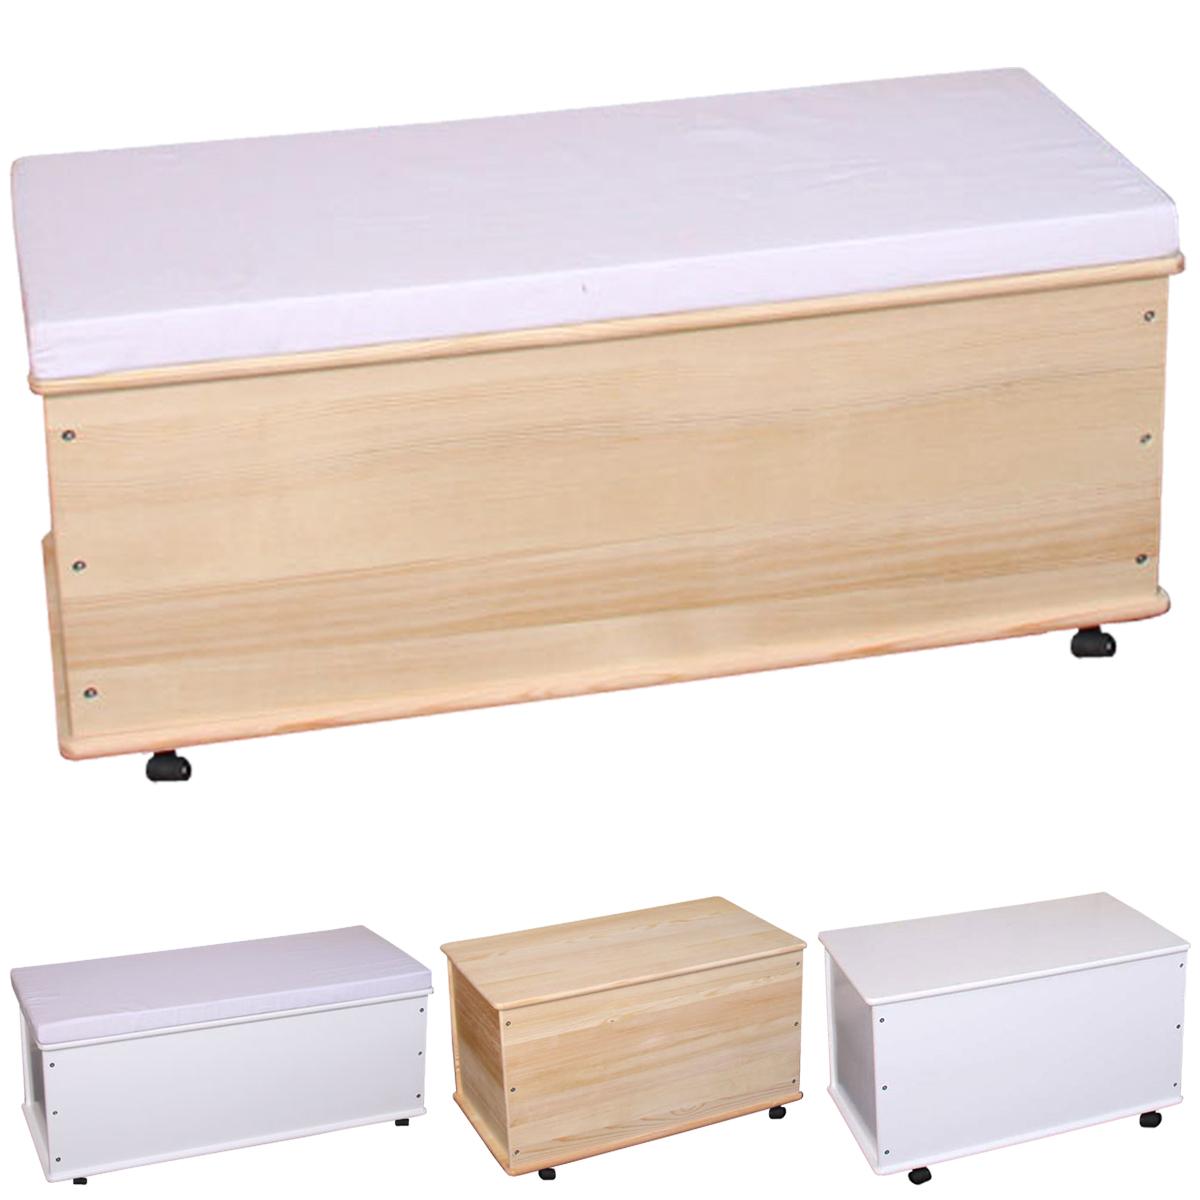 Wäschetruhe Holz Weis Lackiert Wäschekorb ~   Wäschekorb Wäschetruhe Aufbewahrungstruhe Truhe, Kiefer Holz  eBay